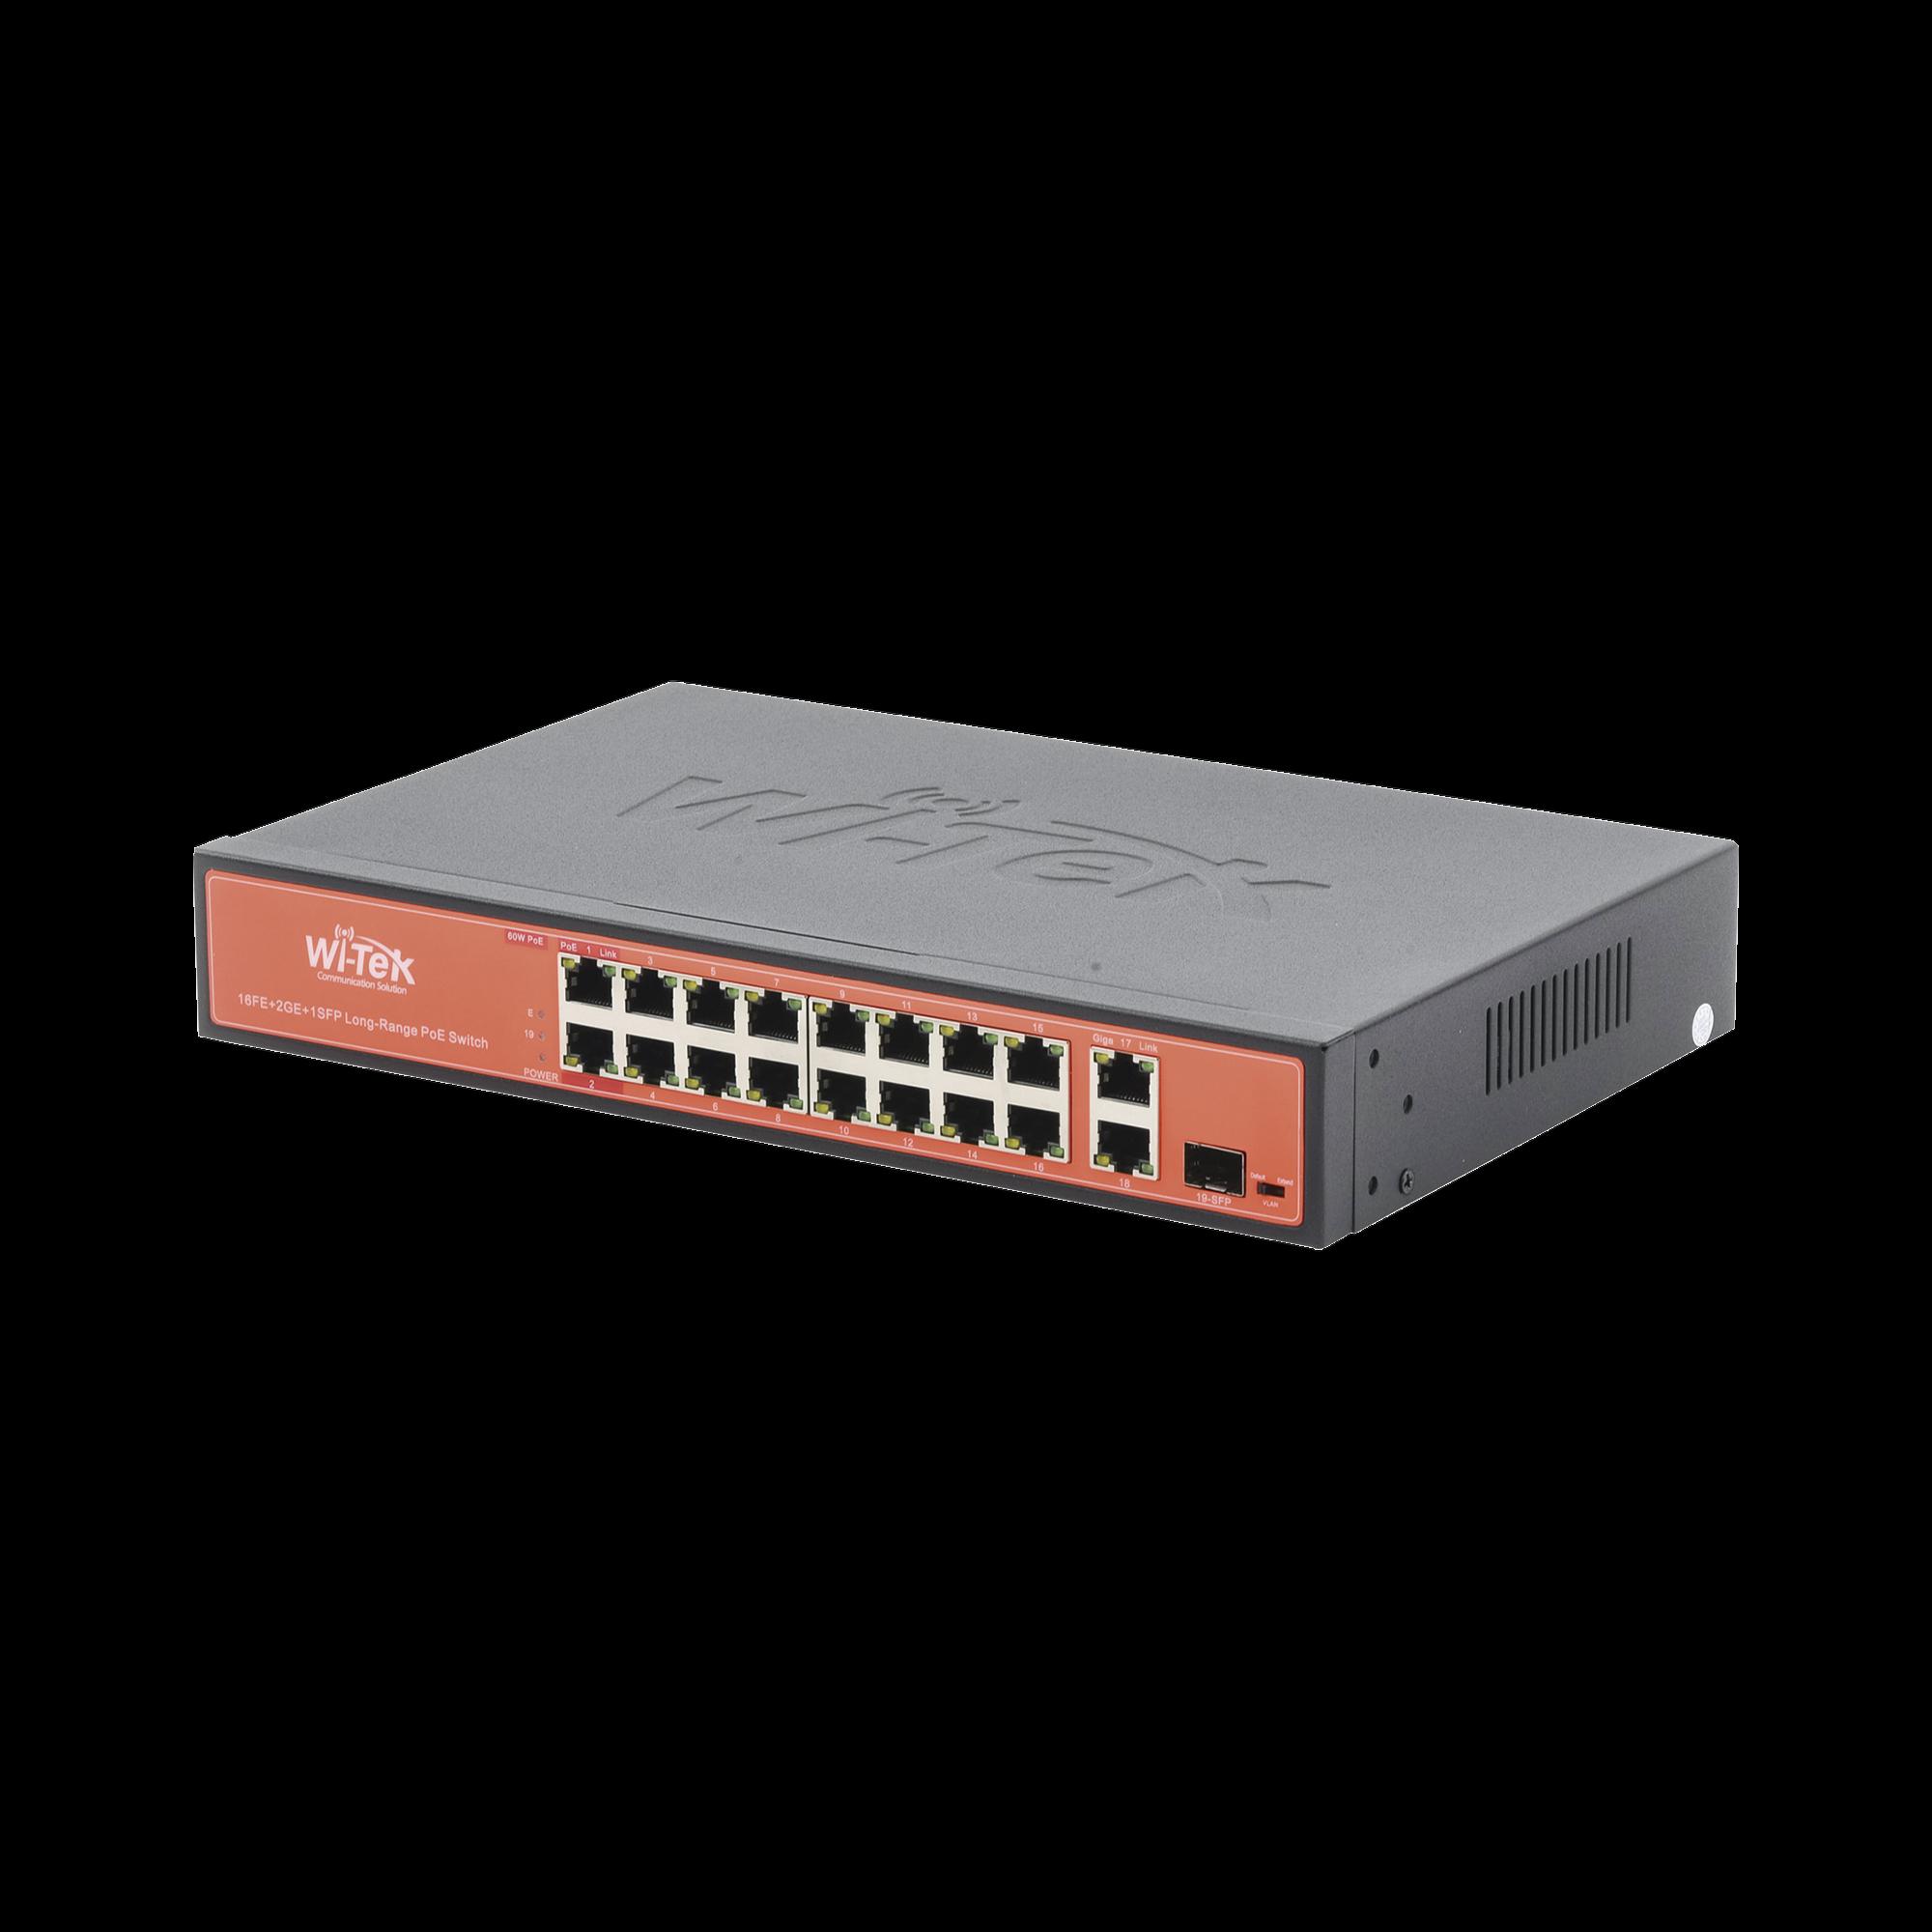 Switch PoE (802.3af/at/bt) no administrable de largo alcance, hasta 250m, 16 x 10/100Mbps (PoE) + 2 x 100/1000Mbps + 1 x SFP, 200 W